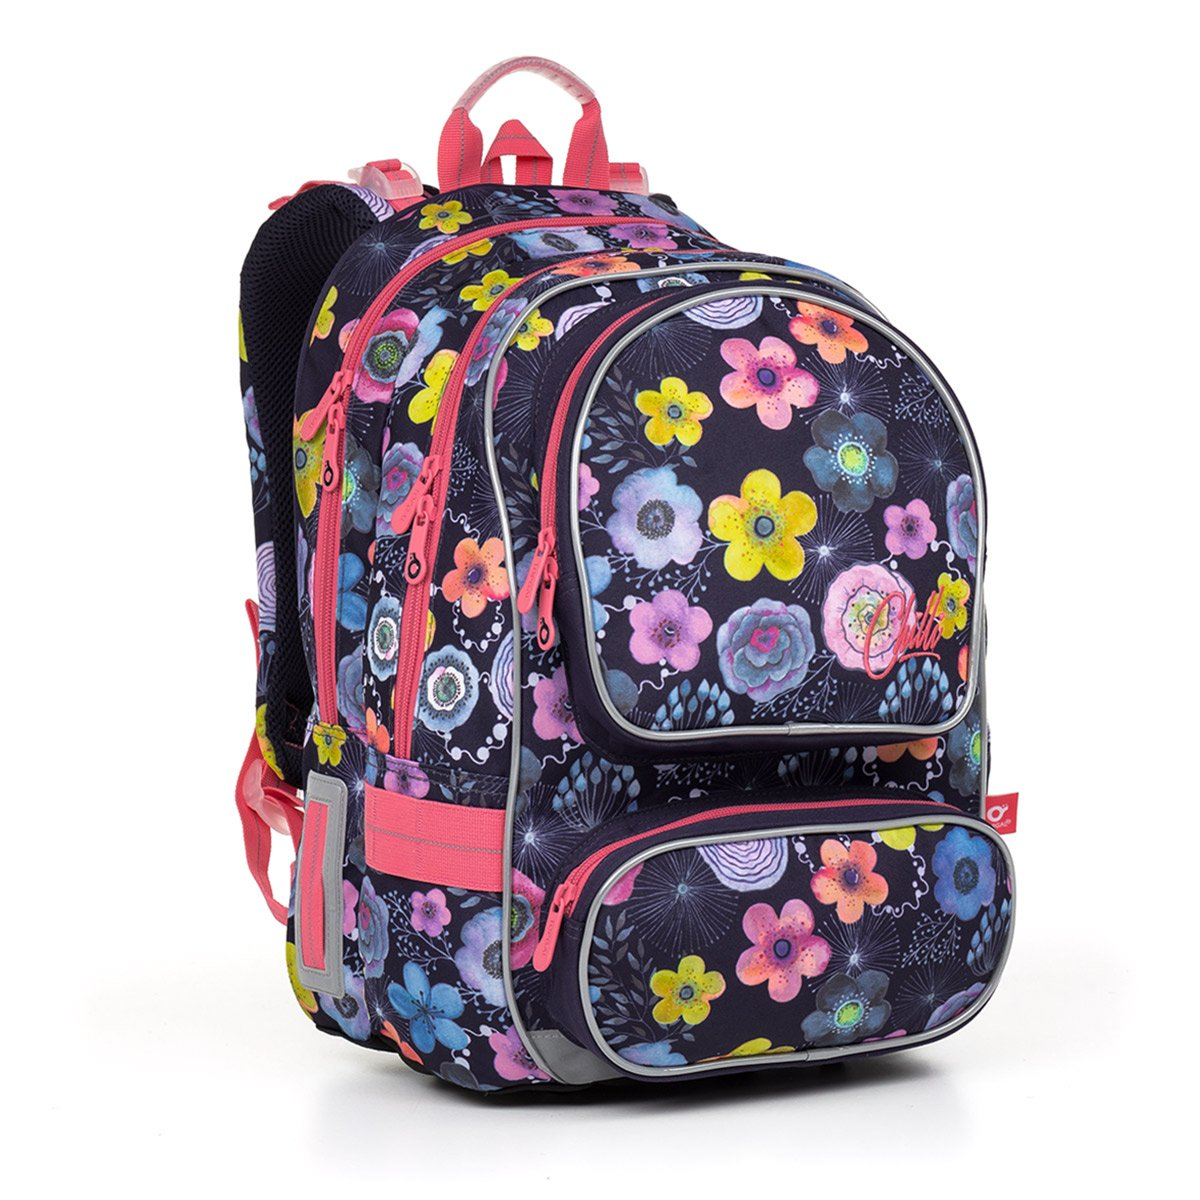 07355ba4d0 Školský batoh Topgal ALLY 17005 G. Študentský batoh Topgal HIT ...